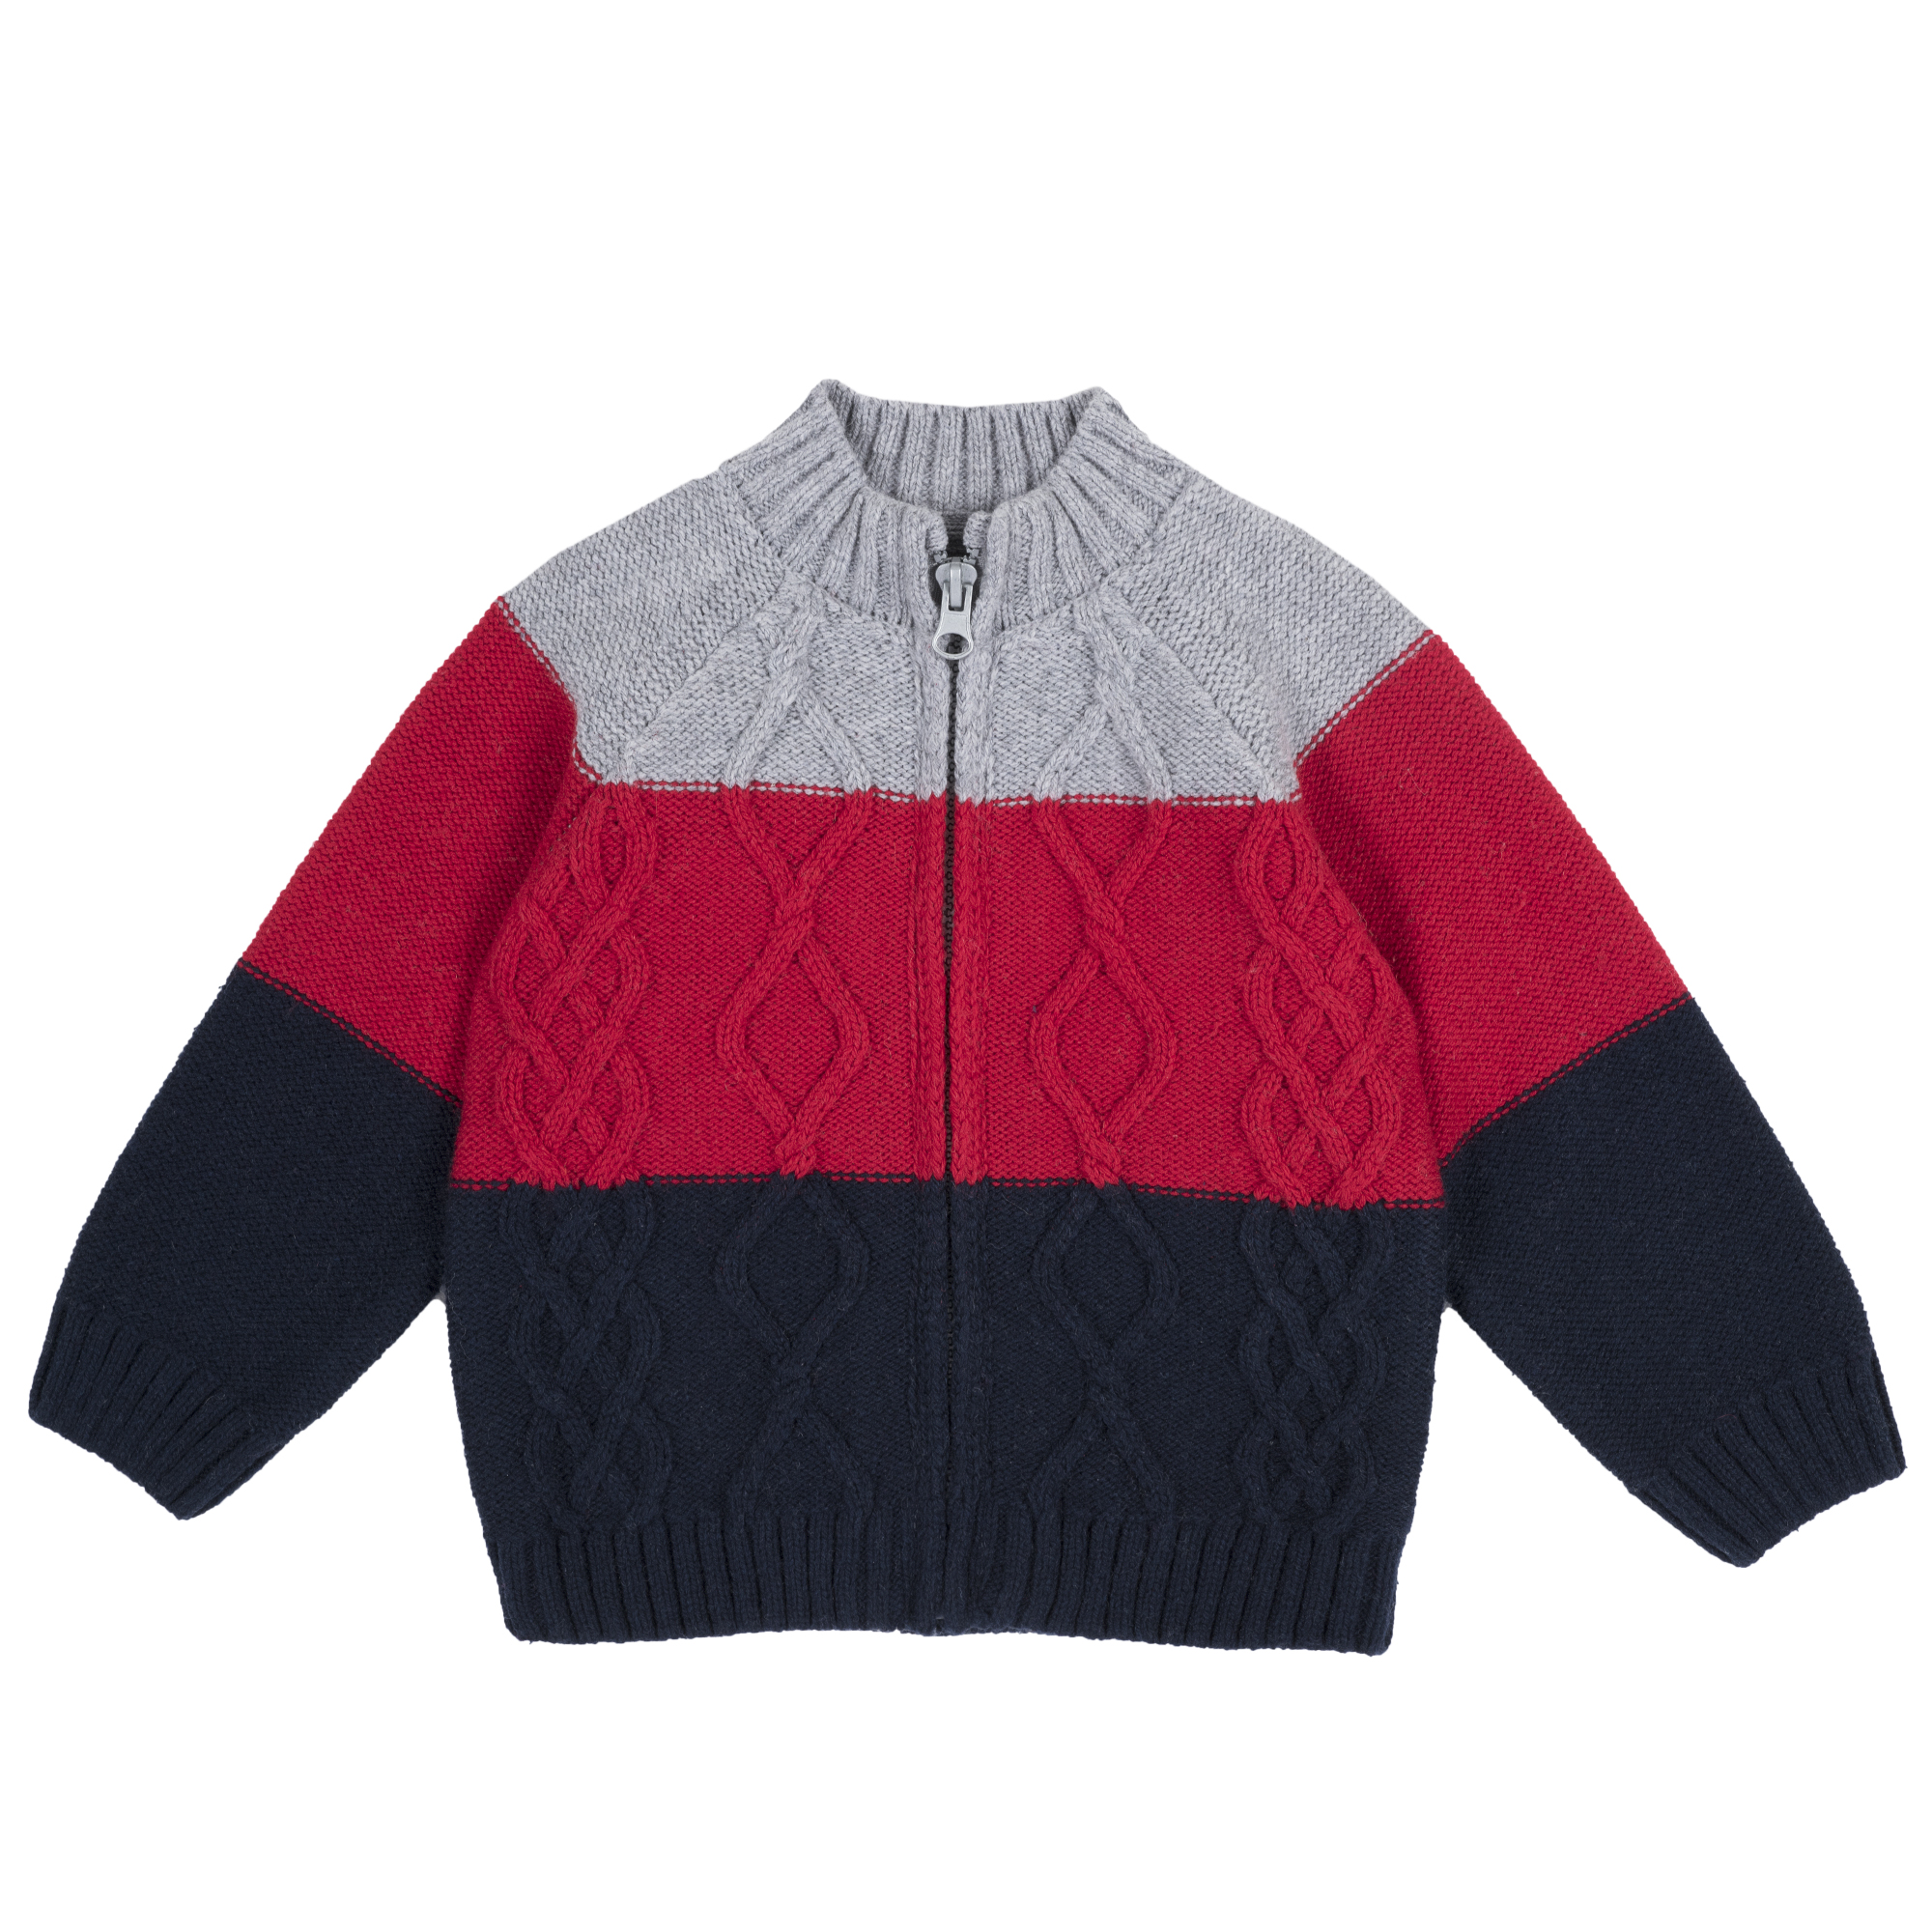 Cardigan copii Chicco, tricotat, multicolor, 96943 din categoria Cardigan copii